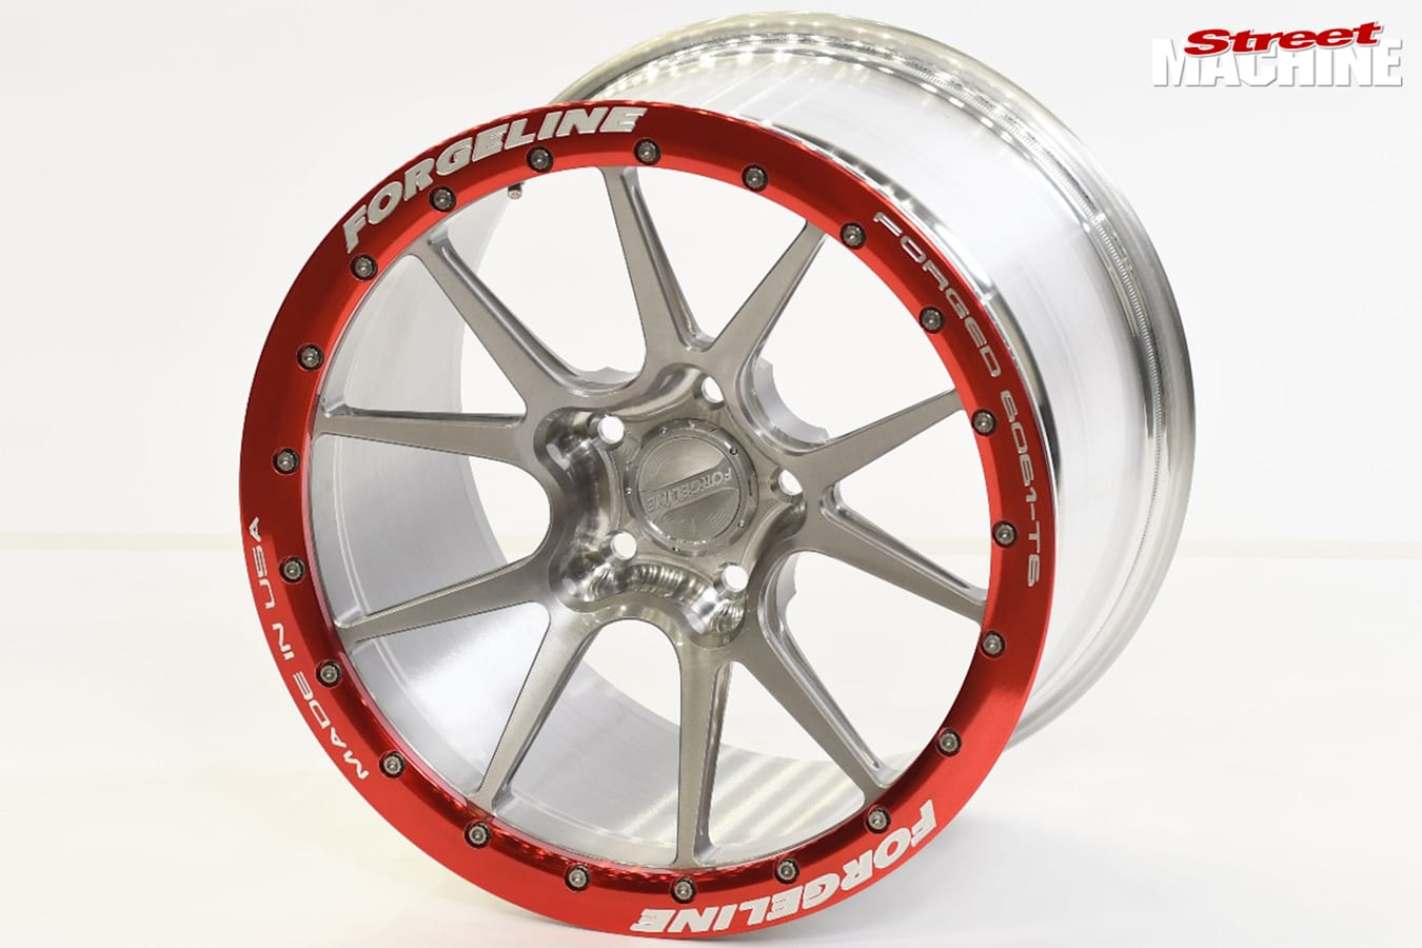 Forgeline racing wheel